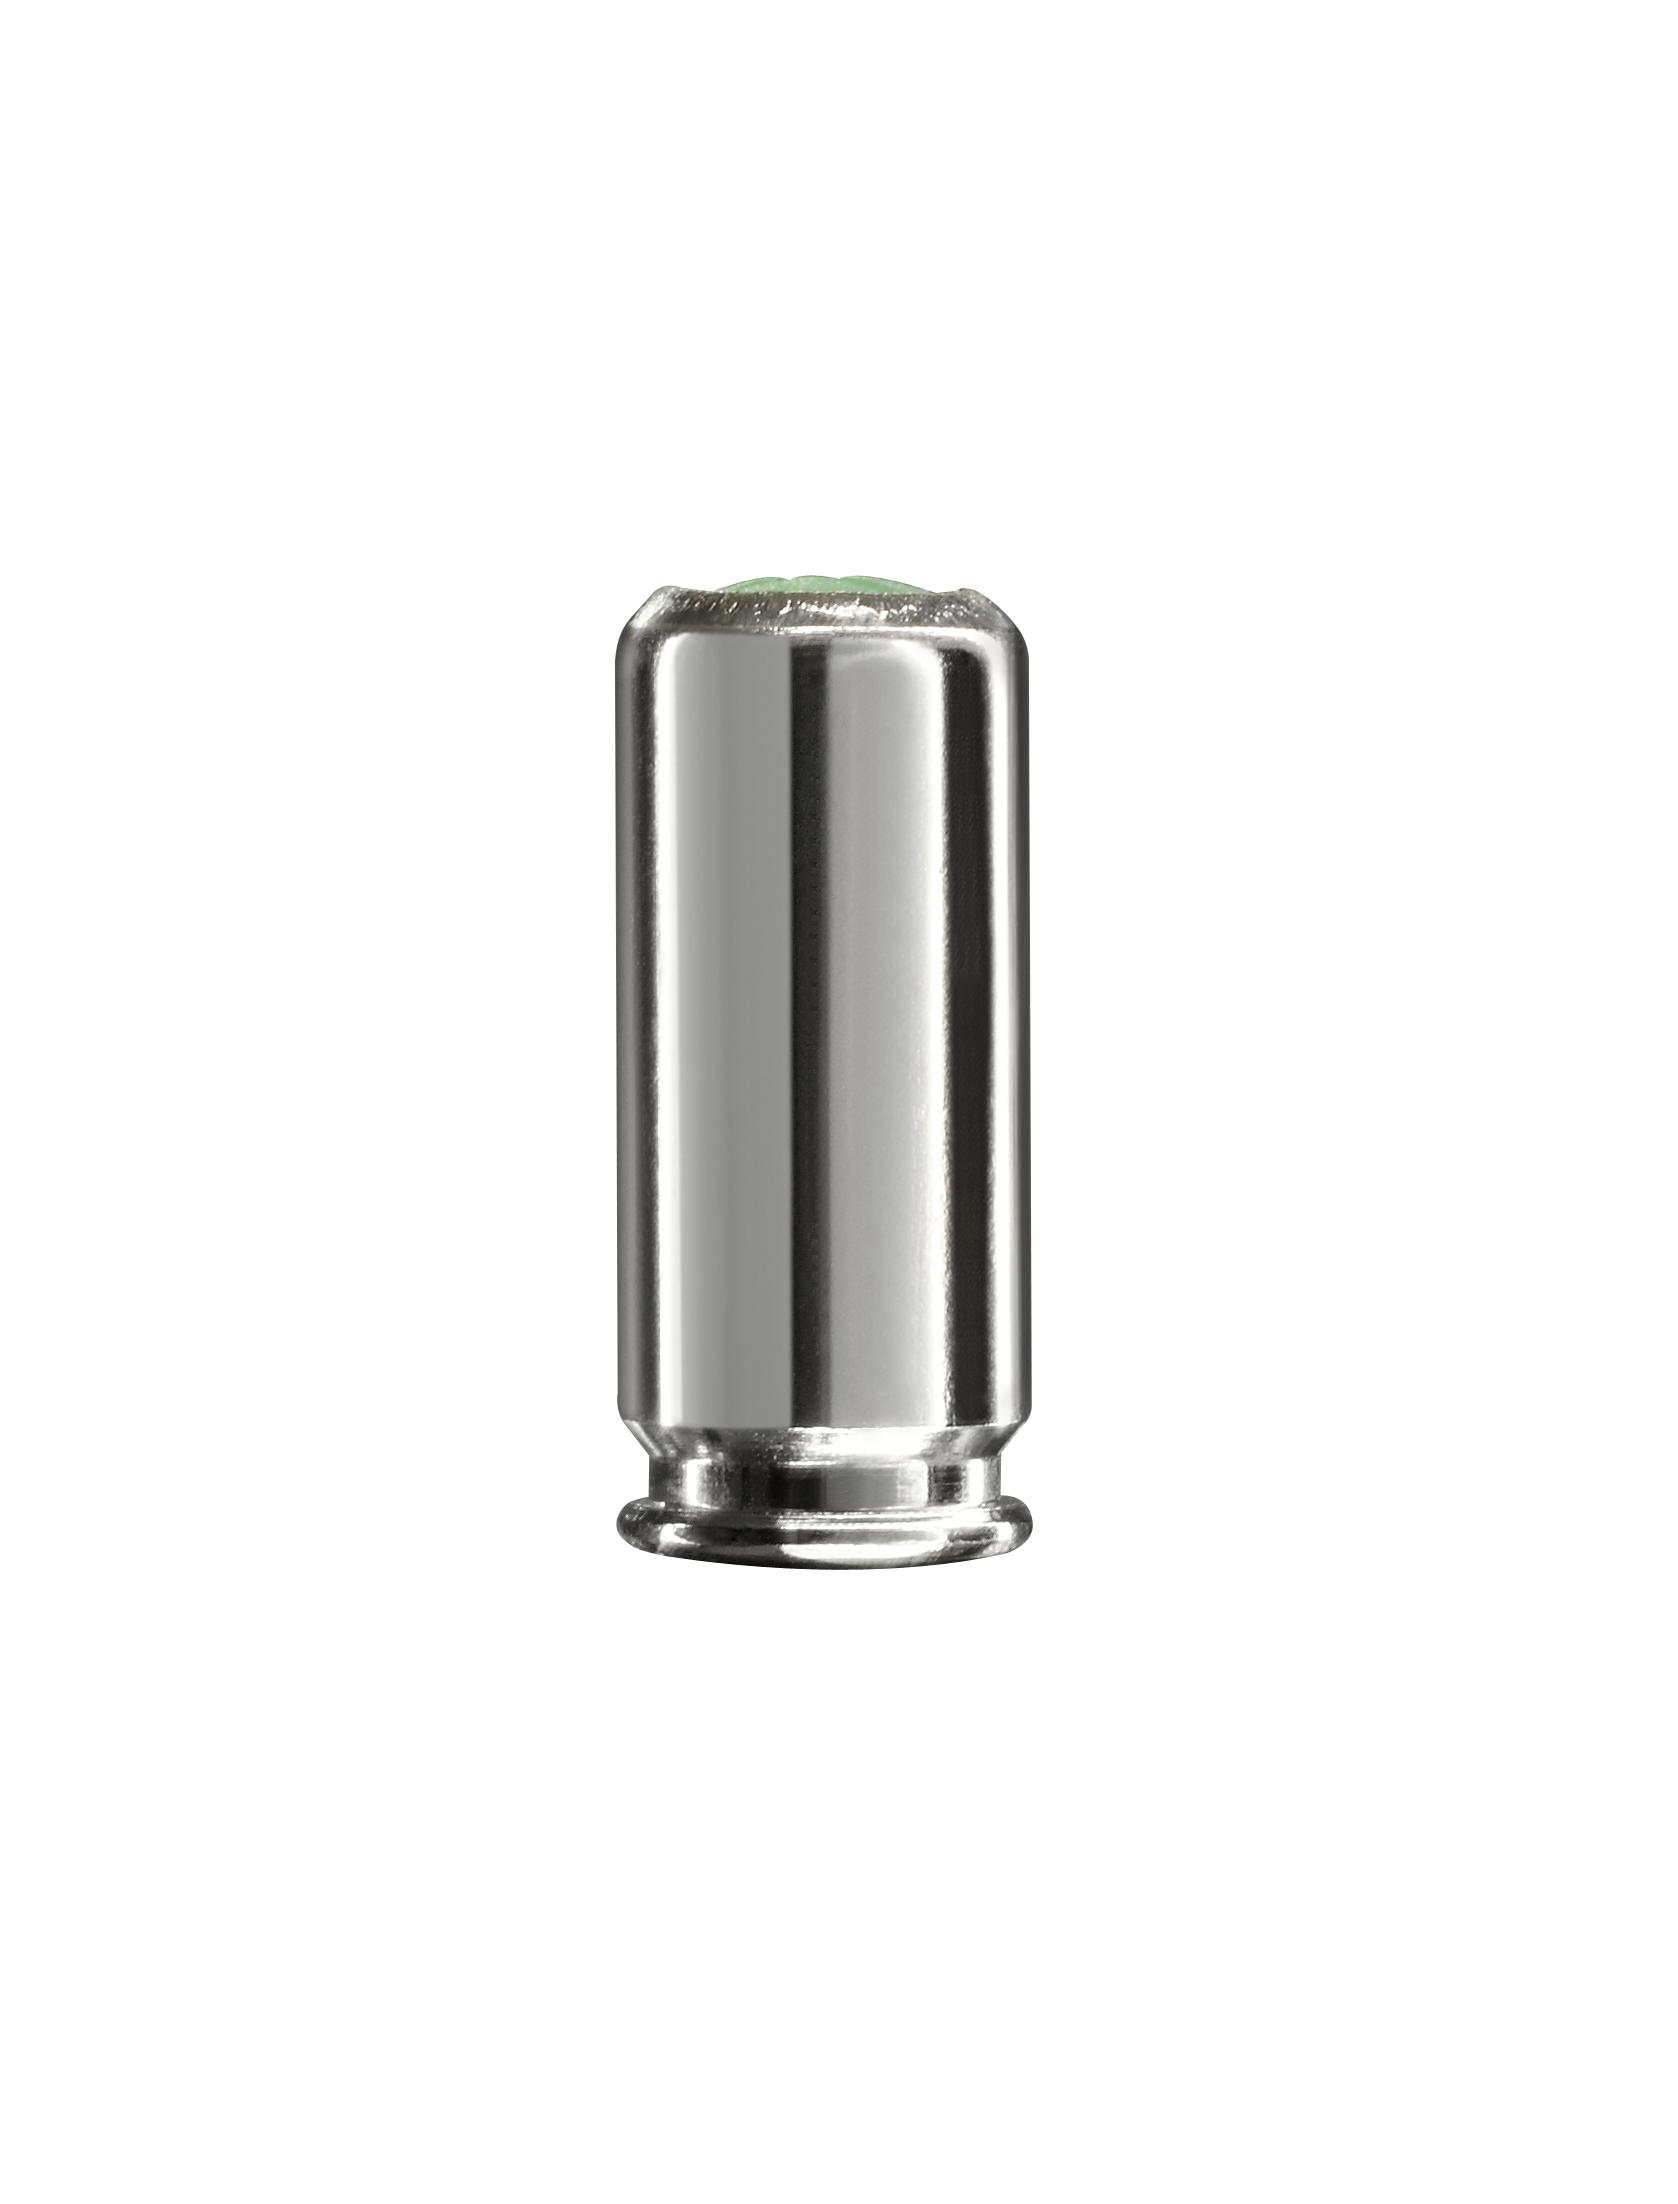 Perfekta Titan Platzpatrone 9mm P.A.K., 300 Schuss